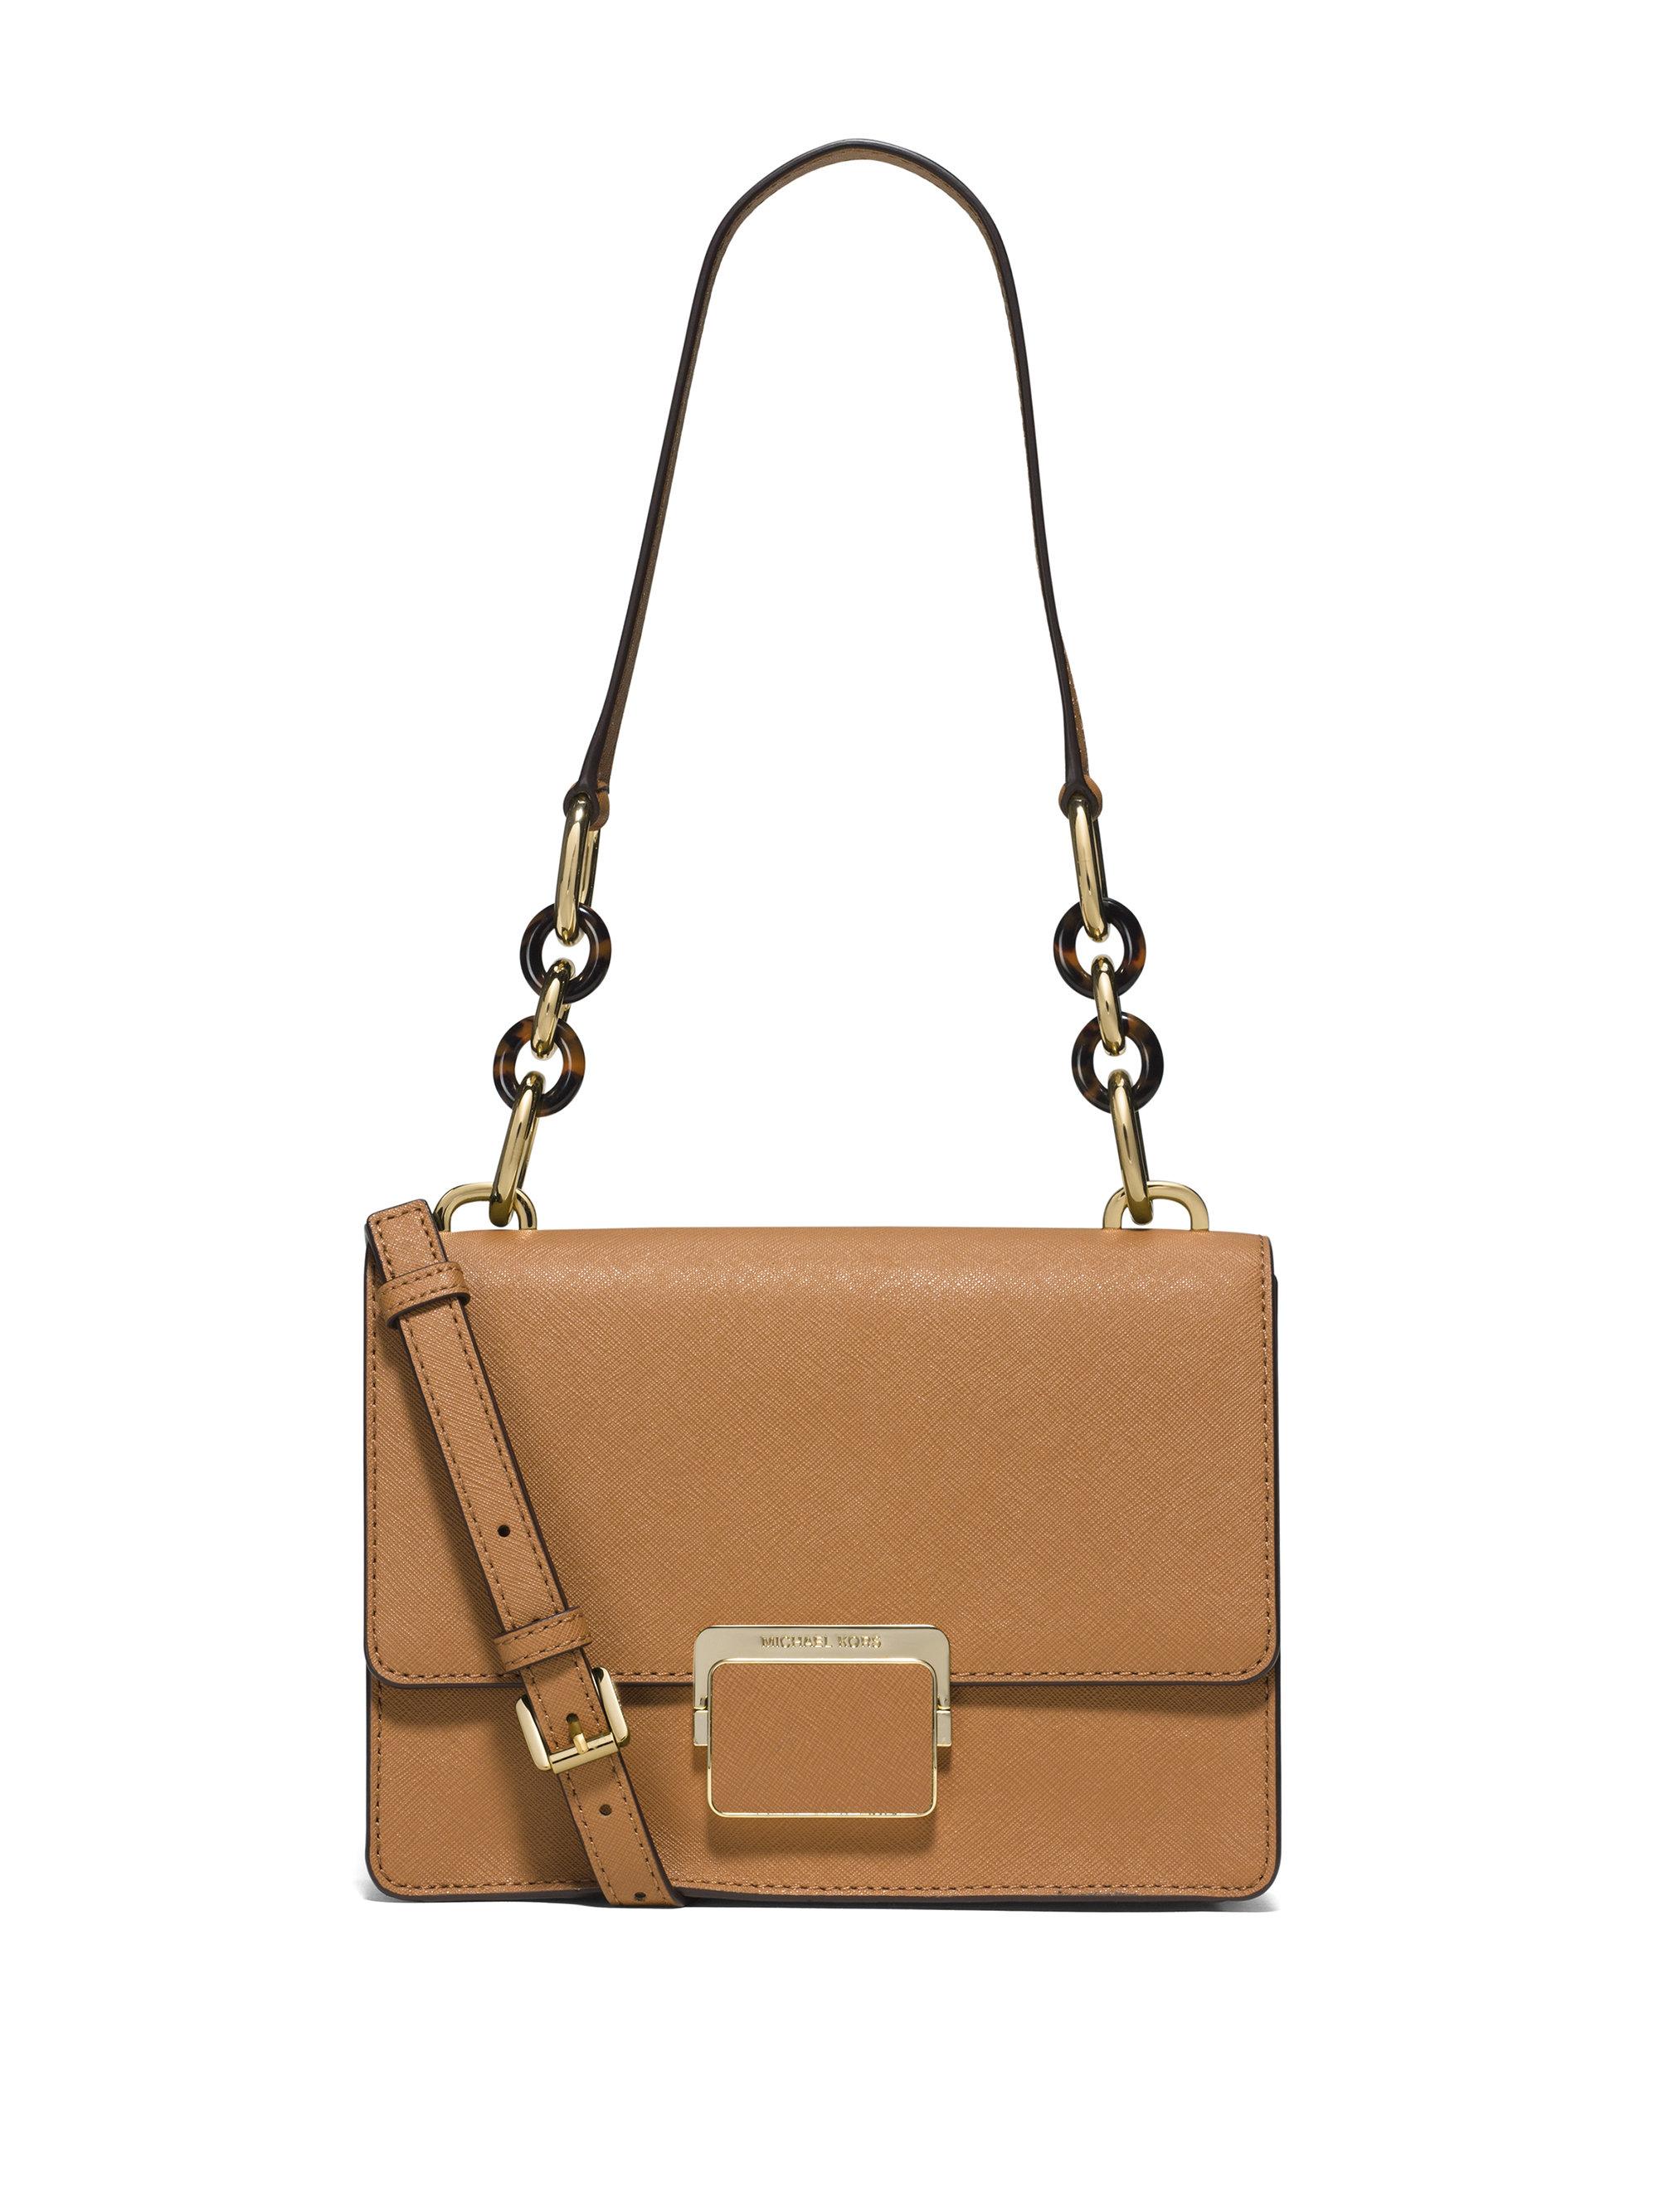 e577115058ef87 ... satchel 1a90d a8edc get lyst michael michael kors cynthia small  saffiano leather shoulder cb22c c083e ...